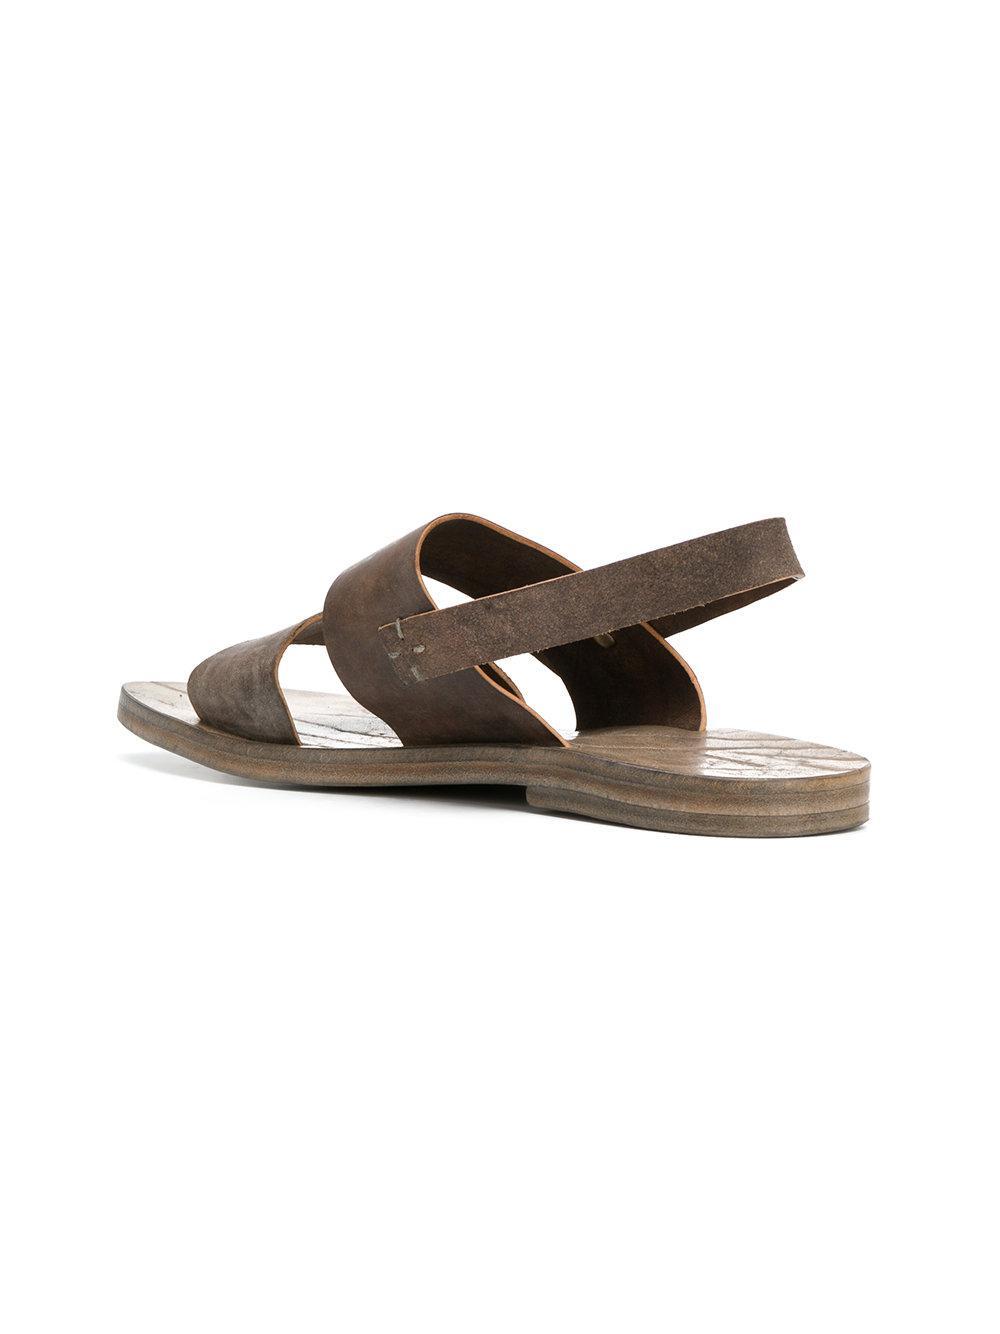 43c80e91407b Lyst - Dimissianos   Miller Slingback Sandals in Brown for Men